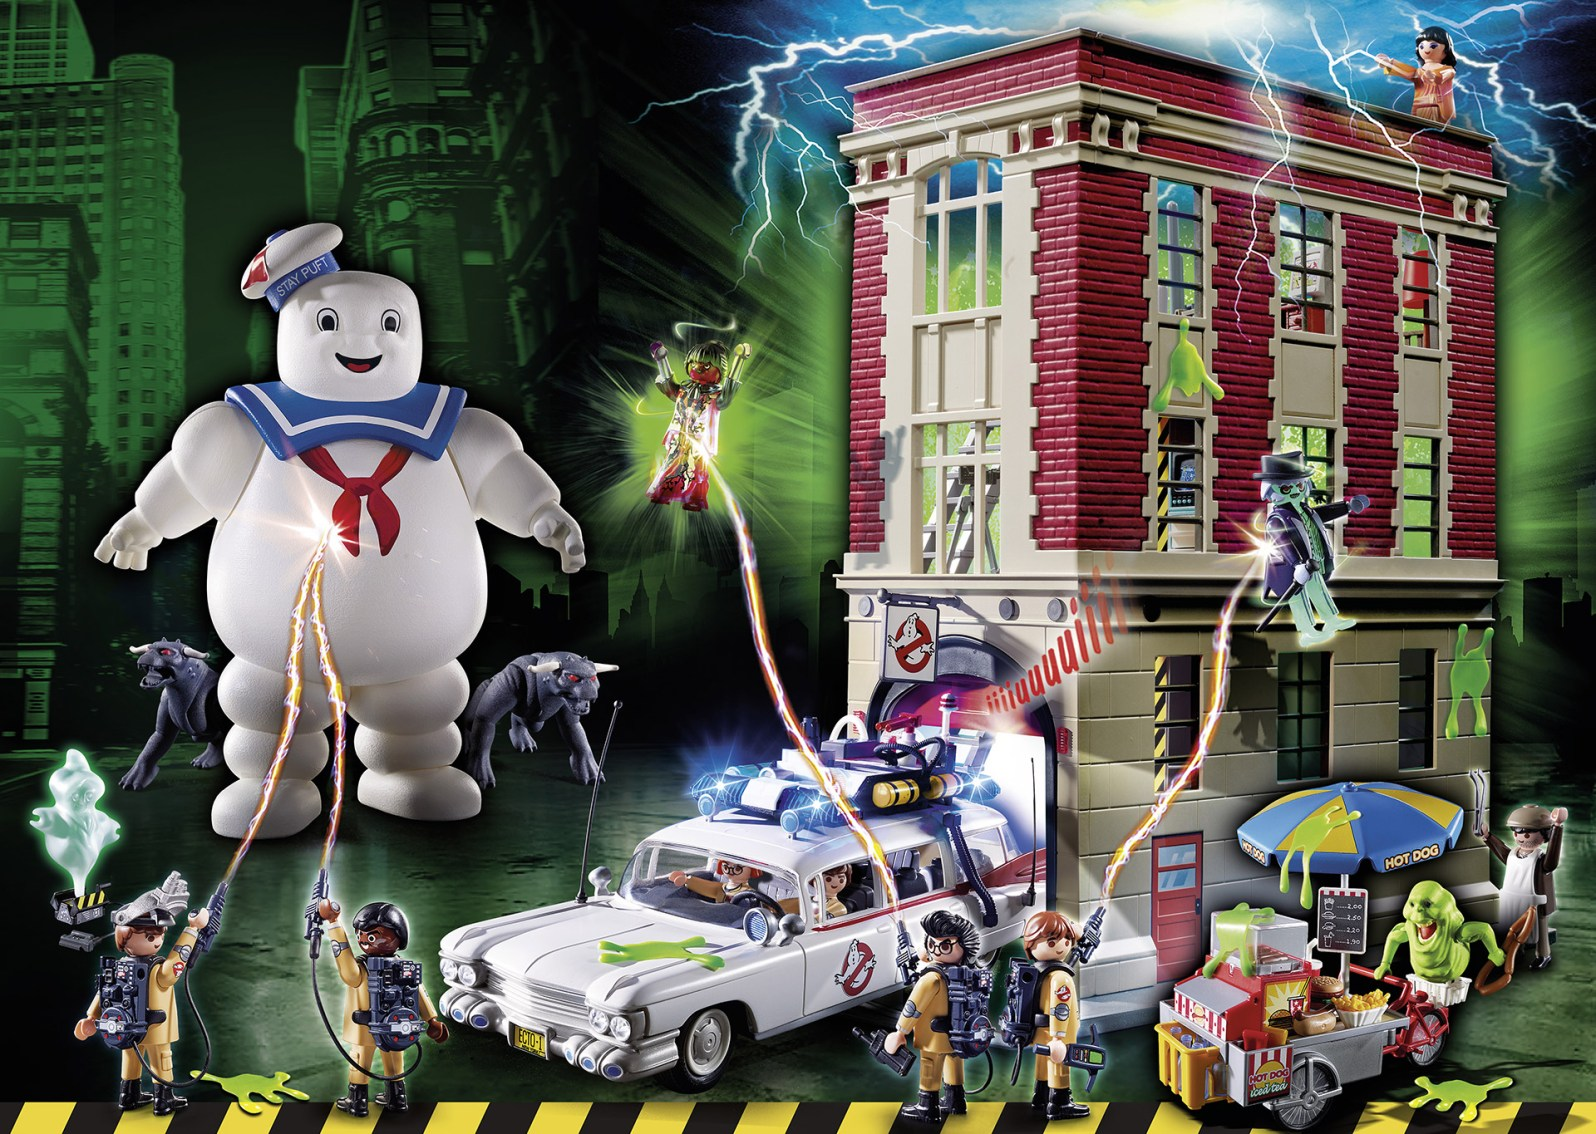 35 Jahre Ghostbusters - PLAYMOBIL Szenerie mit dem aktuellen Ghostbusters Sortiment.